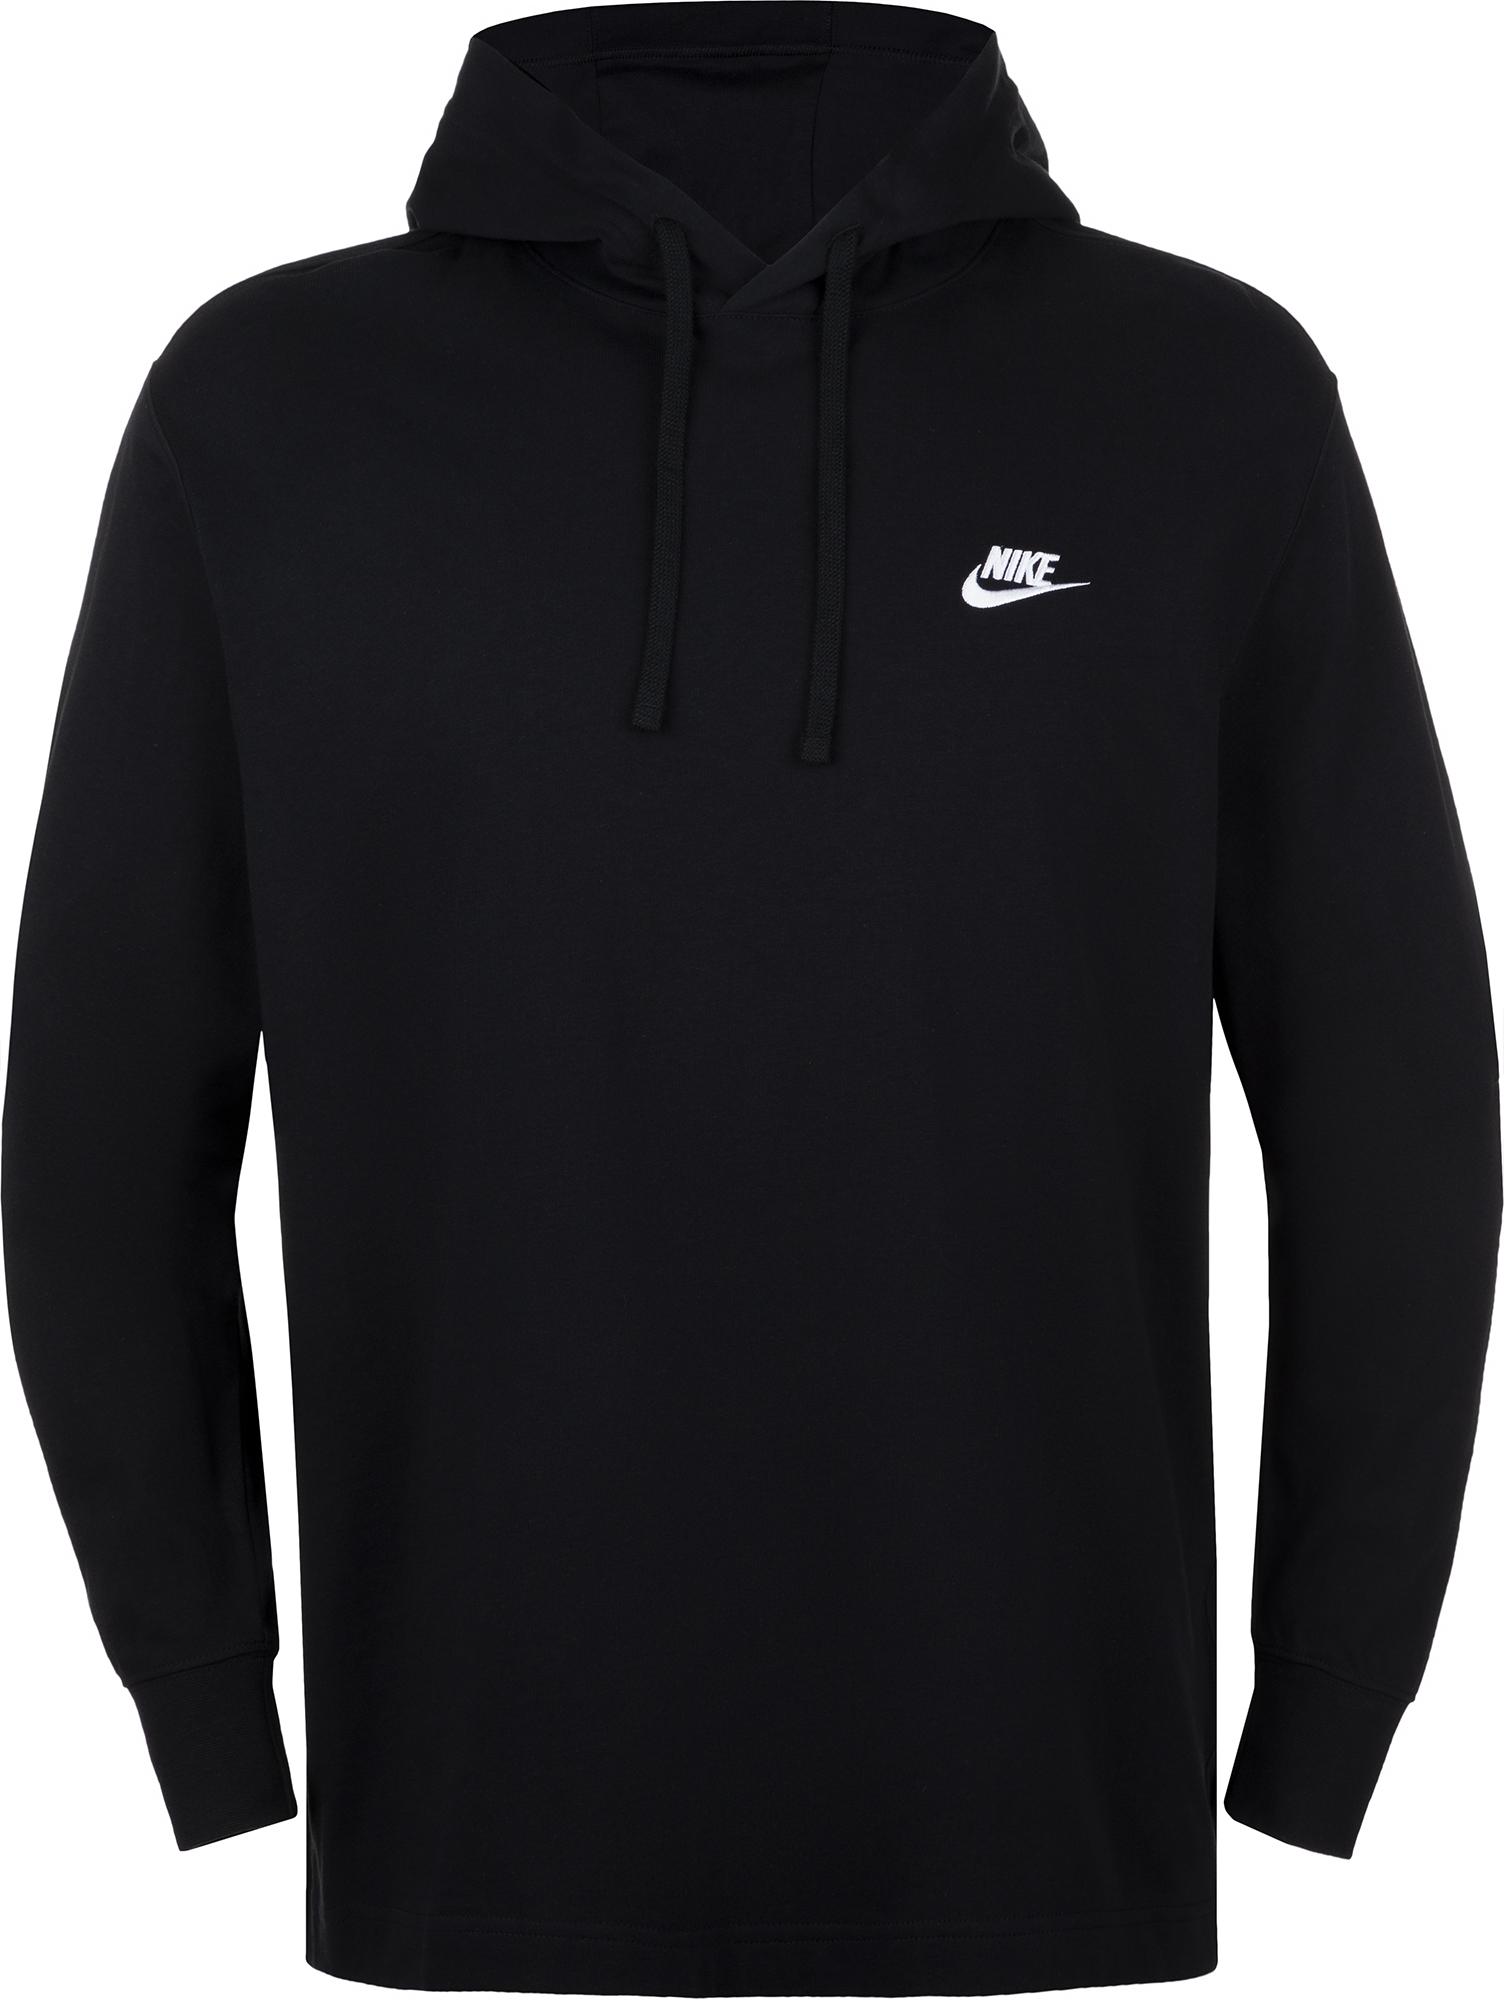 цена Nike Худи мужская Nike Sportswear Club, размер 52-54 онлайн в 2017 году